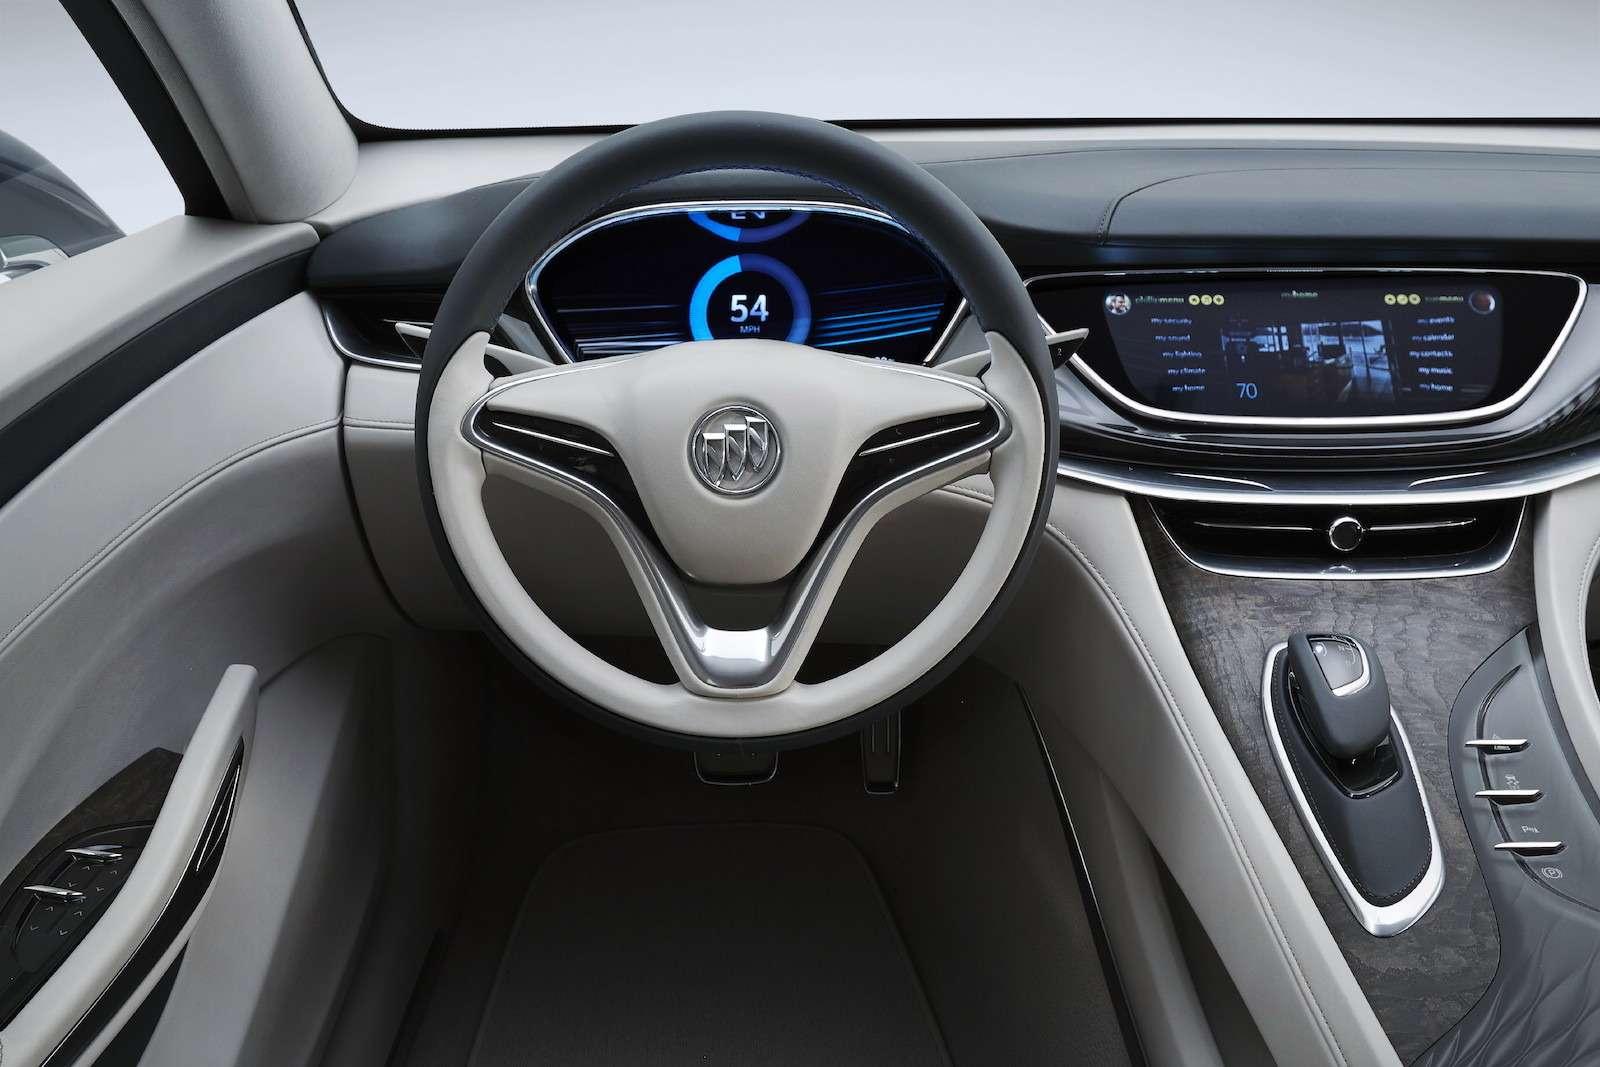 2015-Buick-Avenir-Concept-016